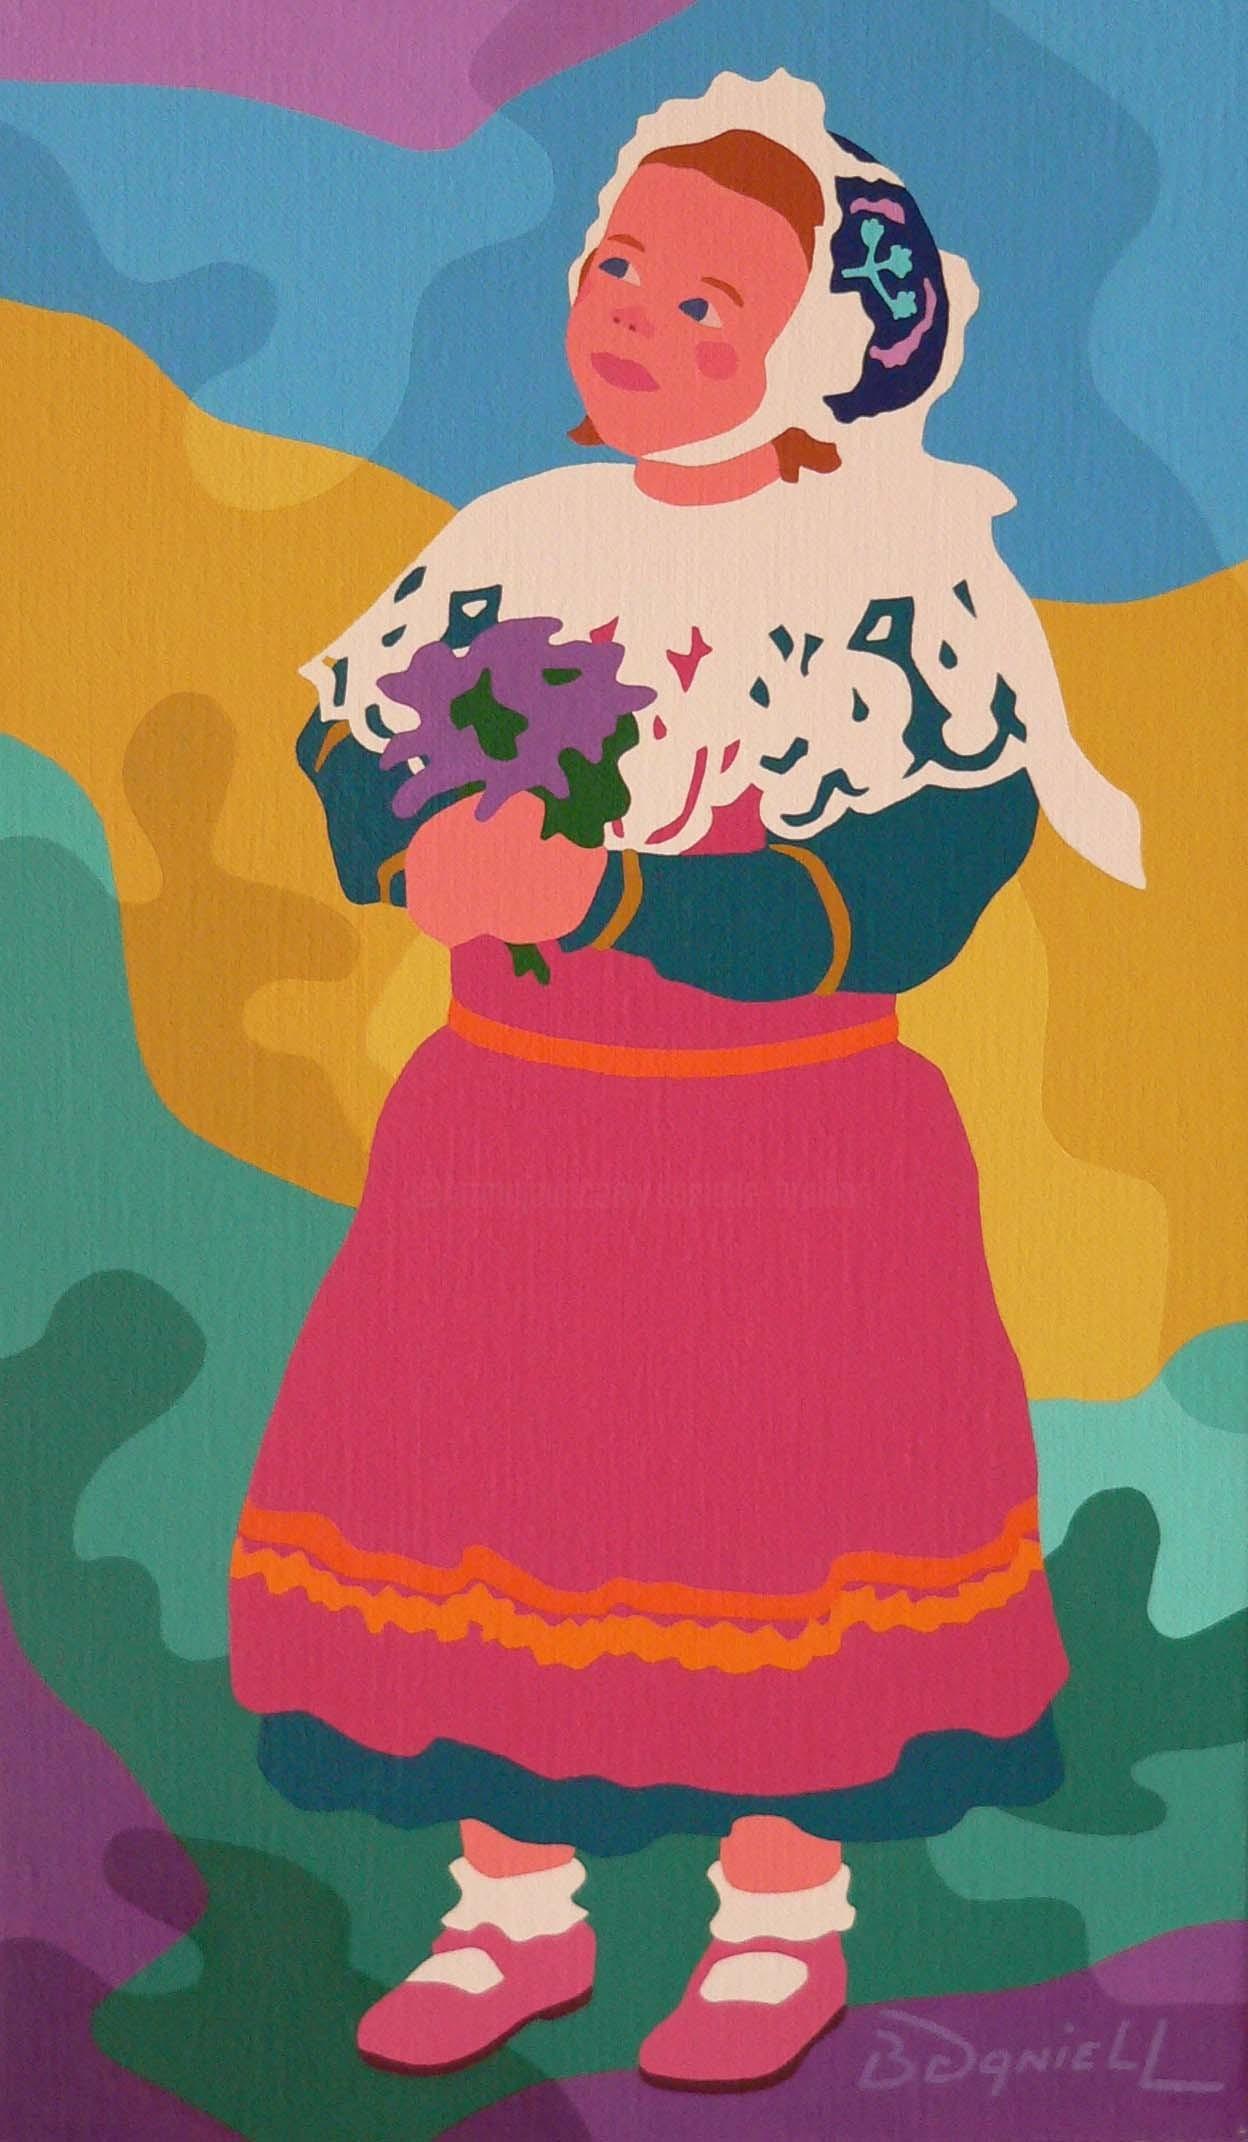 Danielle Braillon (DANIELL) - La petite fille au tablier rose